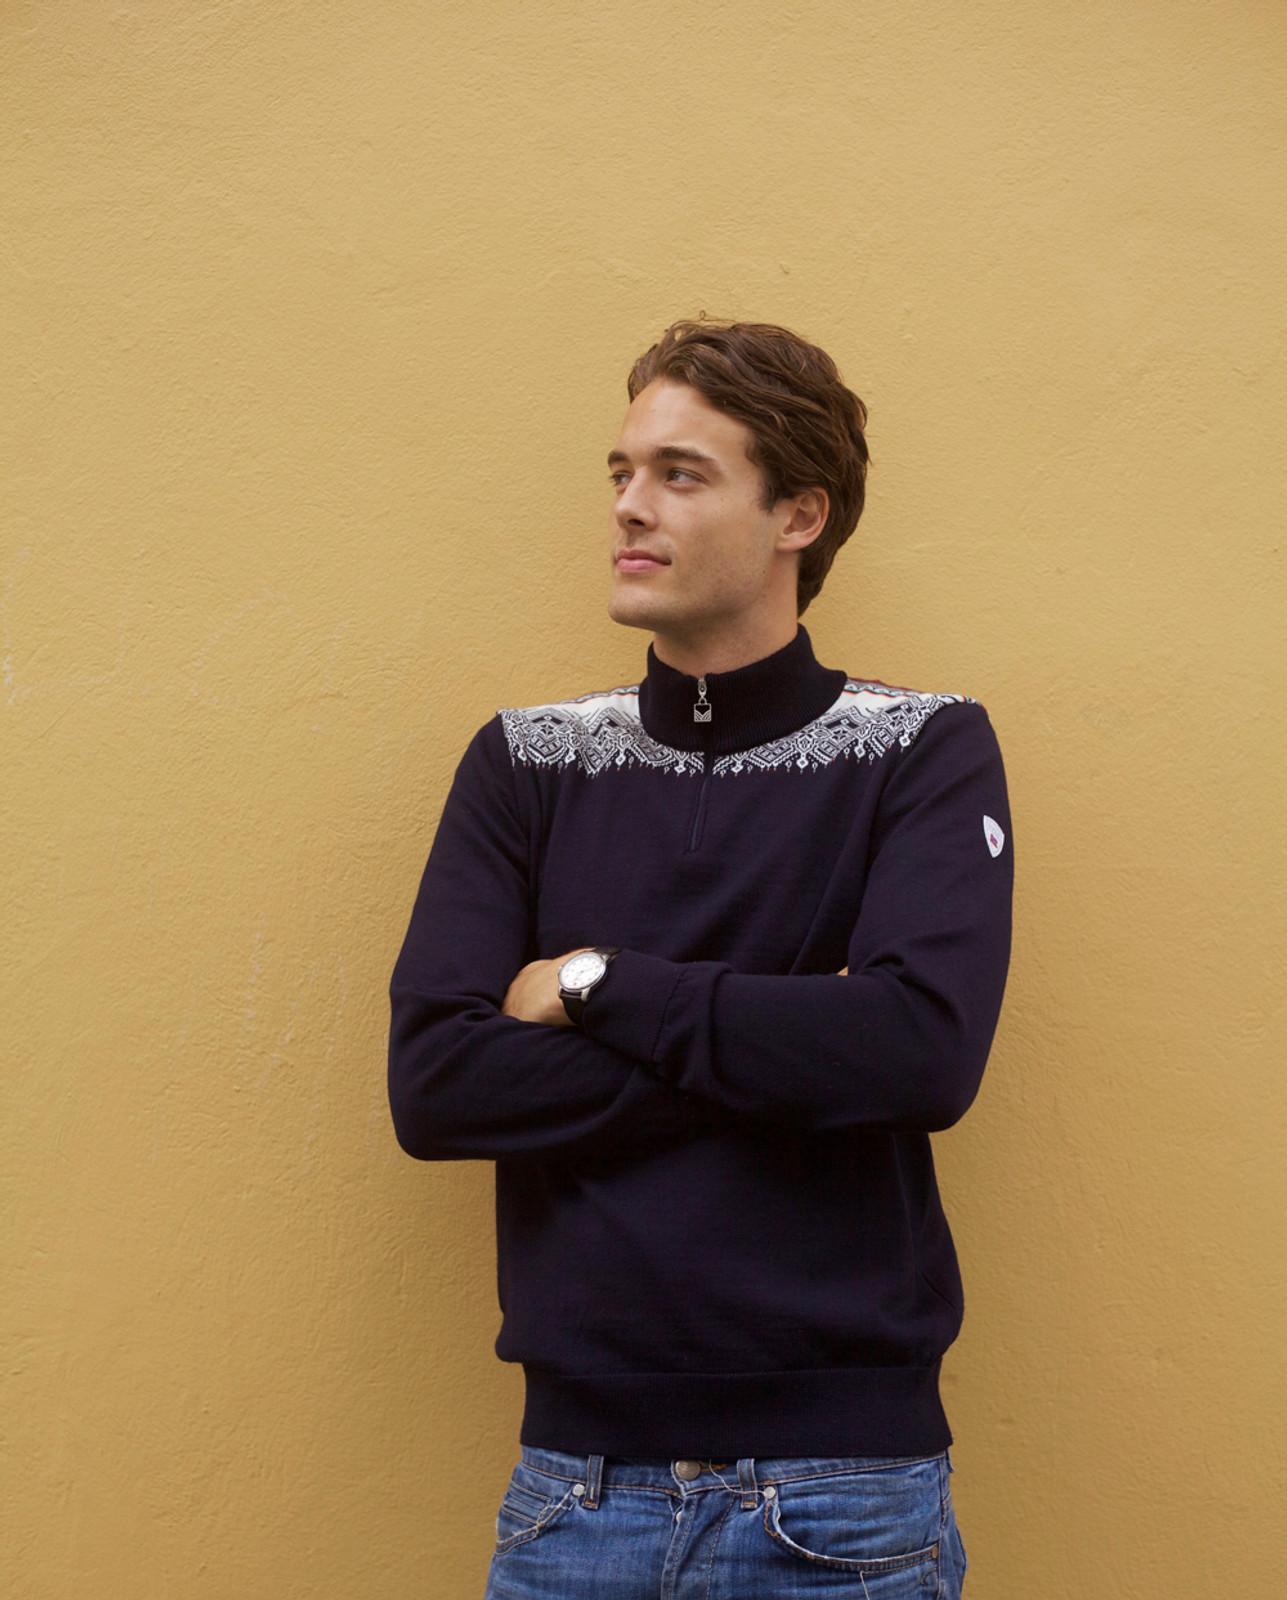 Boy wearing Dale of Norway mens Fiemme Sweater in Dark Charcoal/Grau Vig/Raspberry/Off White, 93421-T.